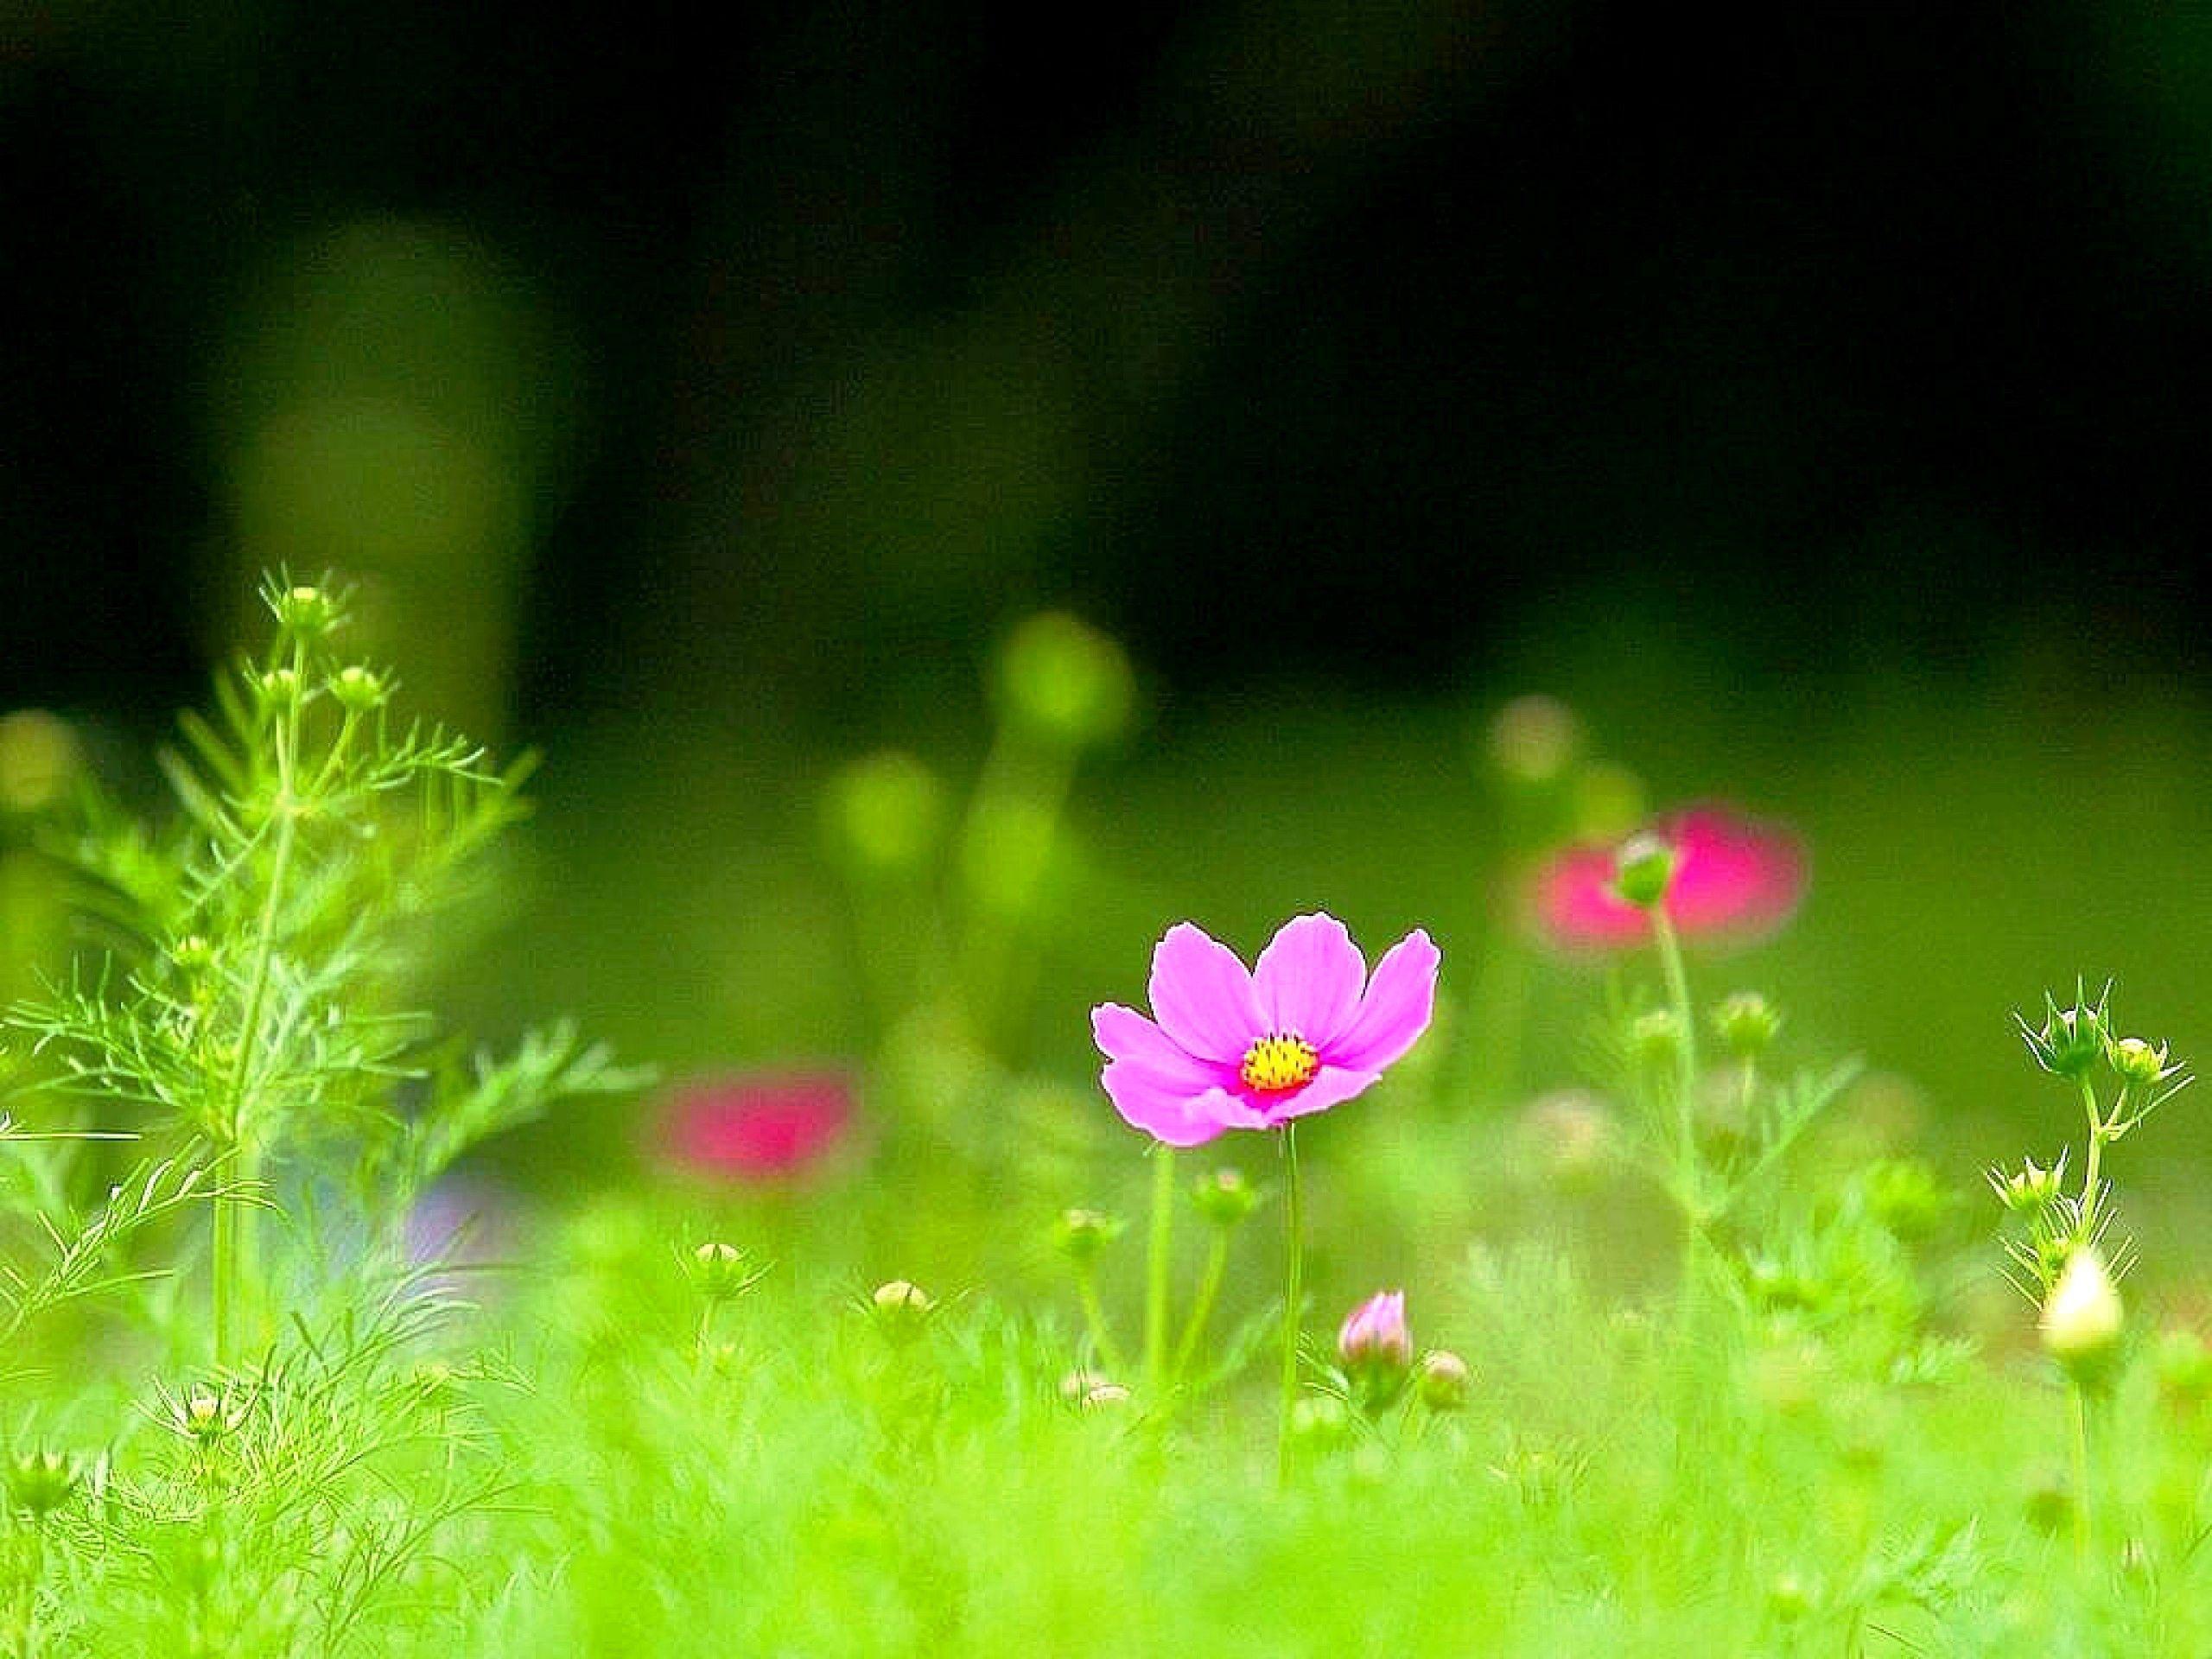 beautiful green grass wallpapers - photo #19